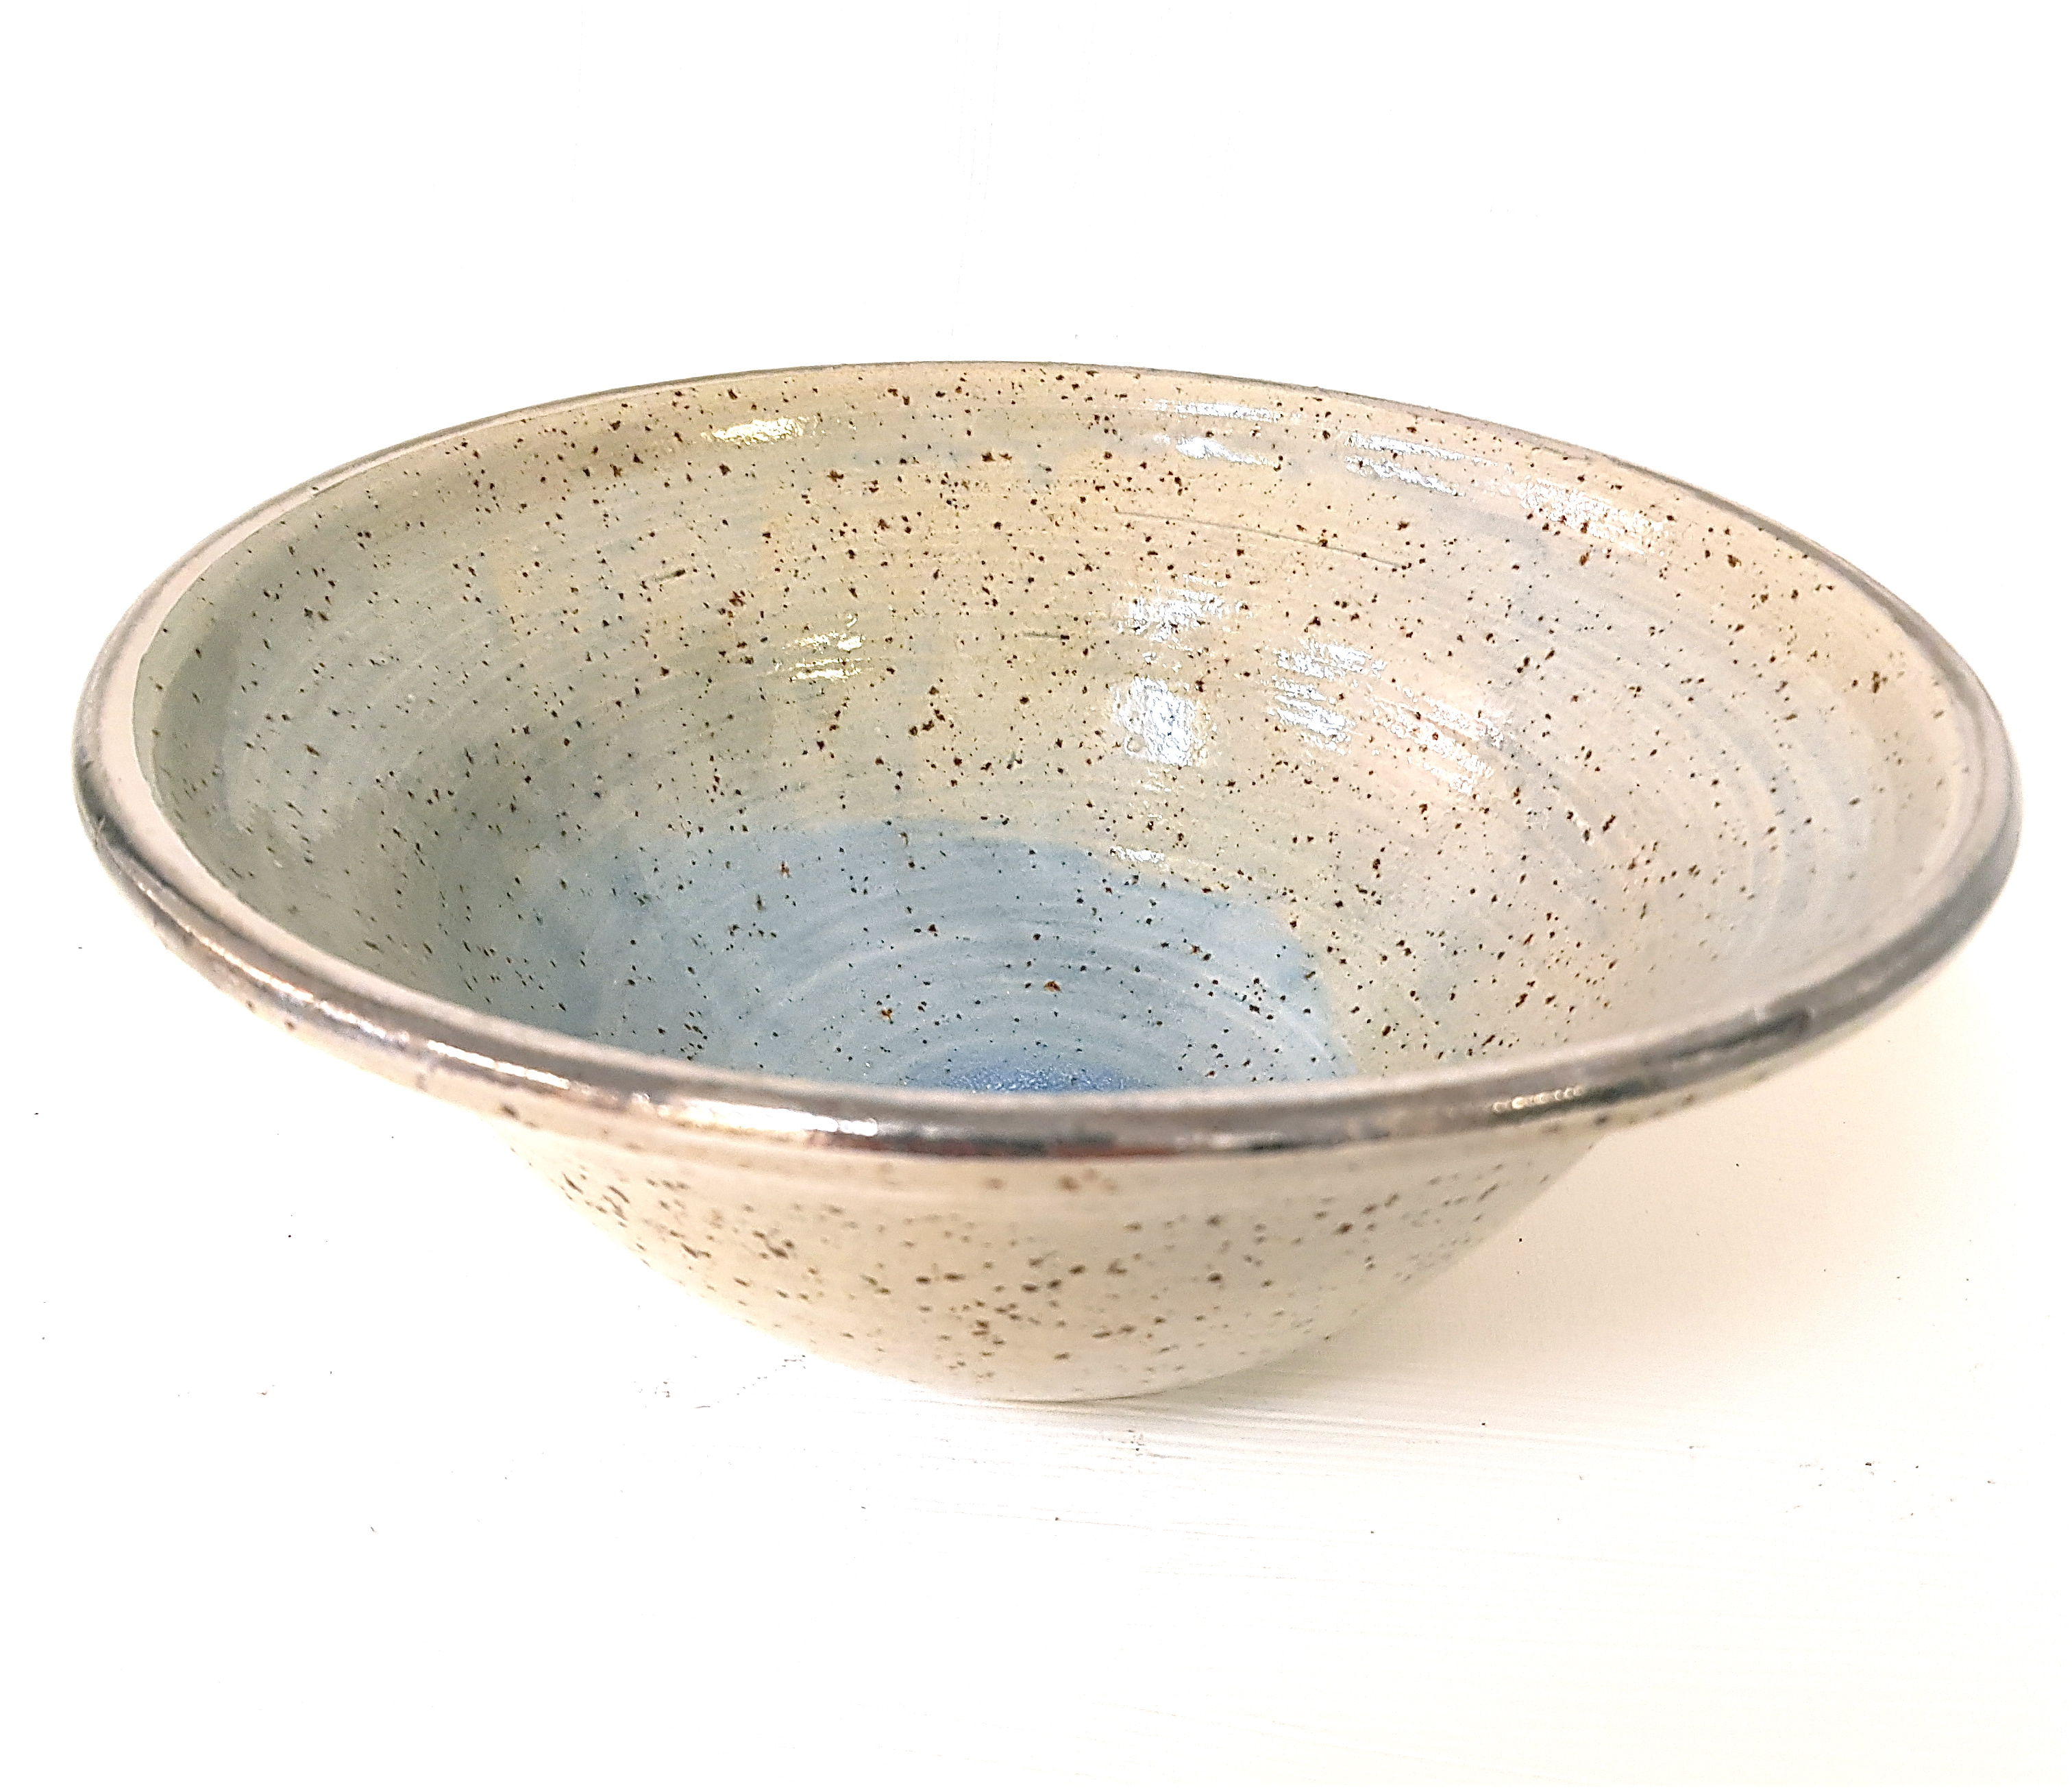 Töpferei la Ceramica, Schale mit Silberrand, Schale, Unikat, Keramik